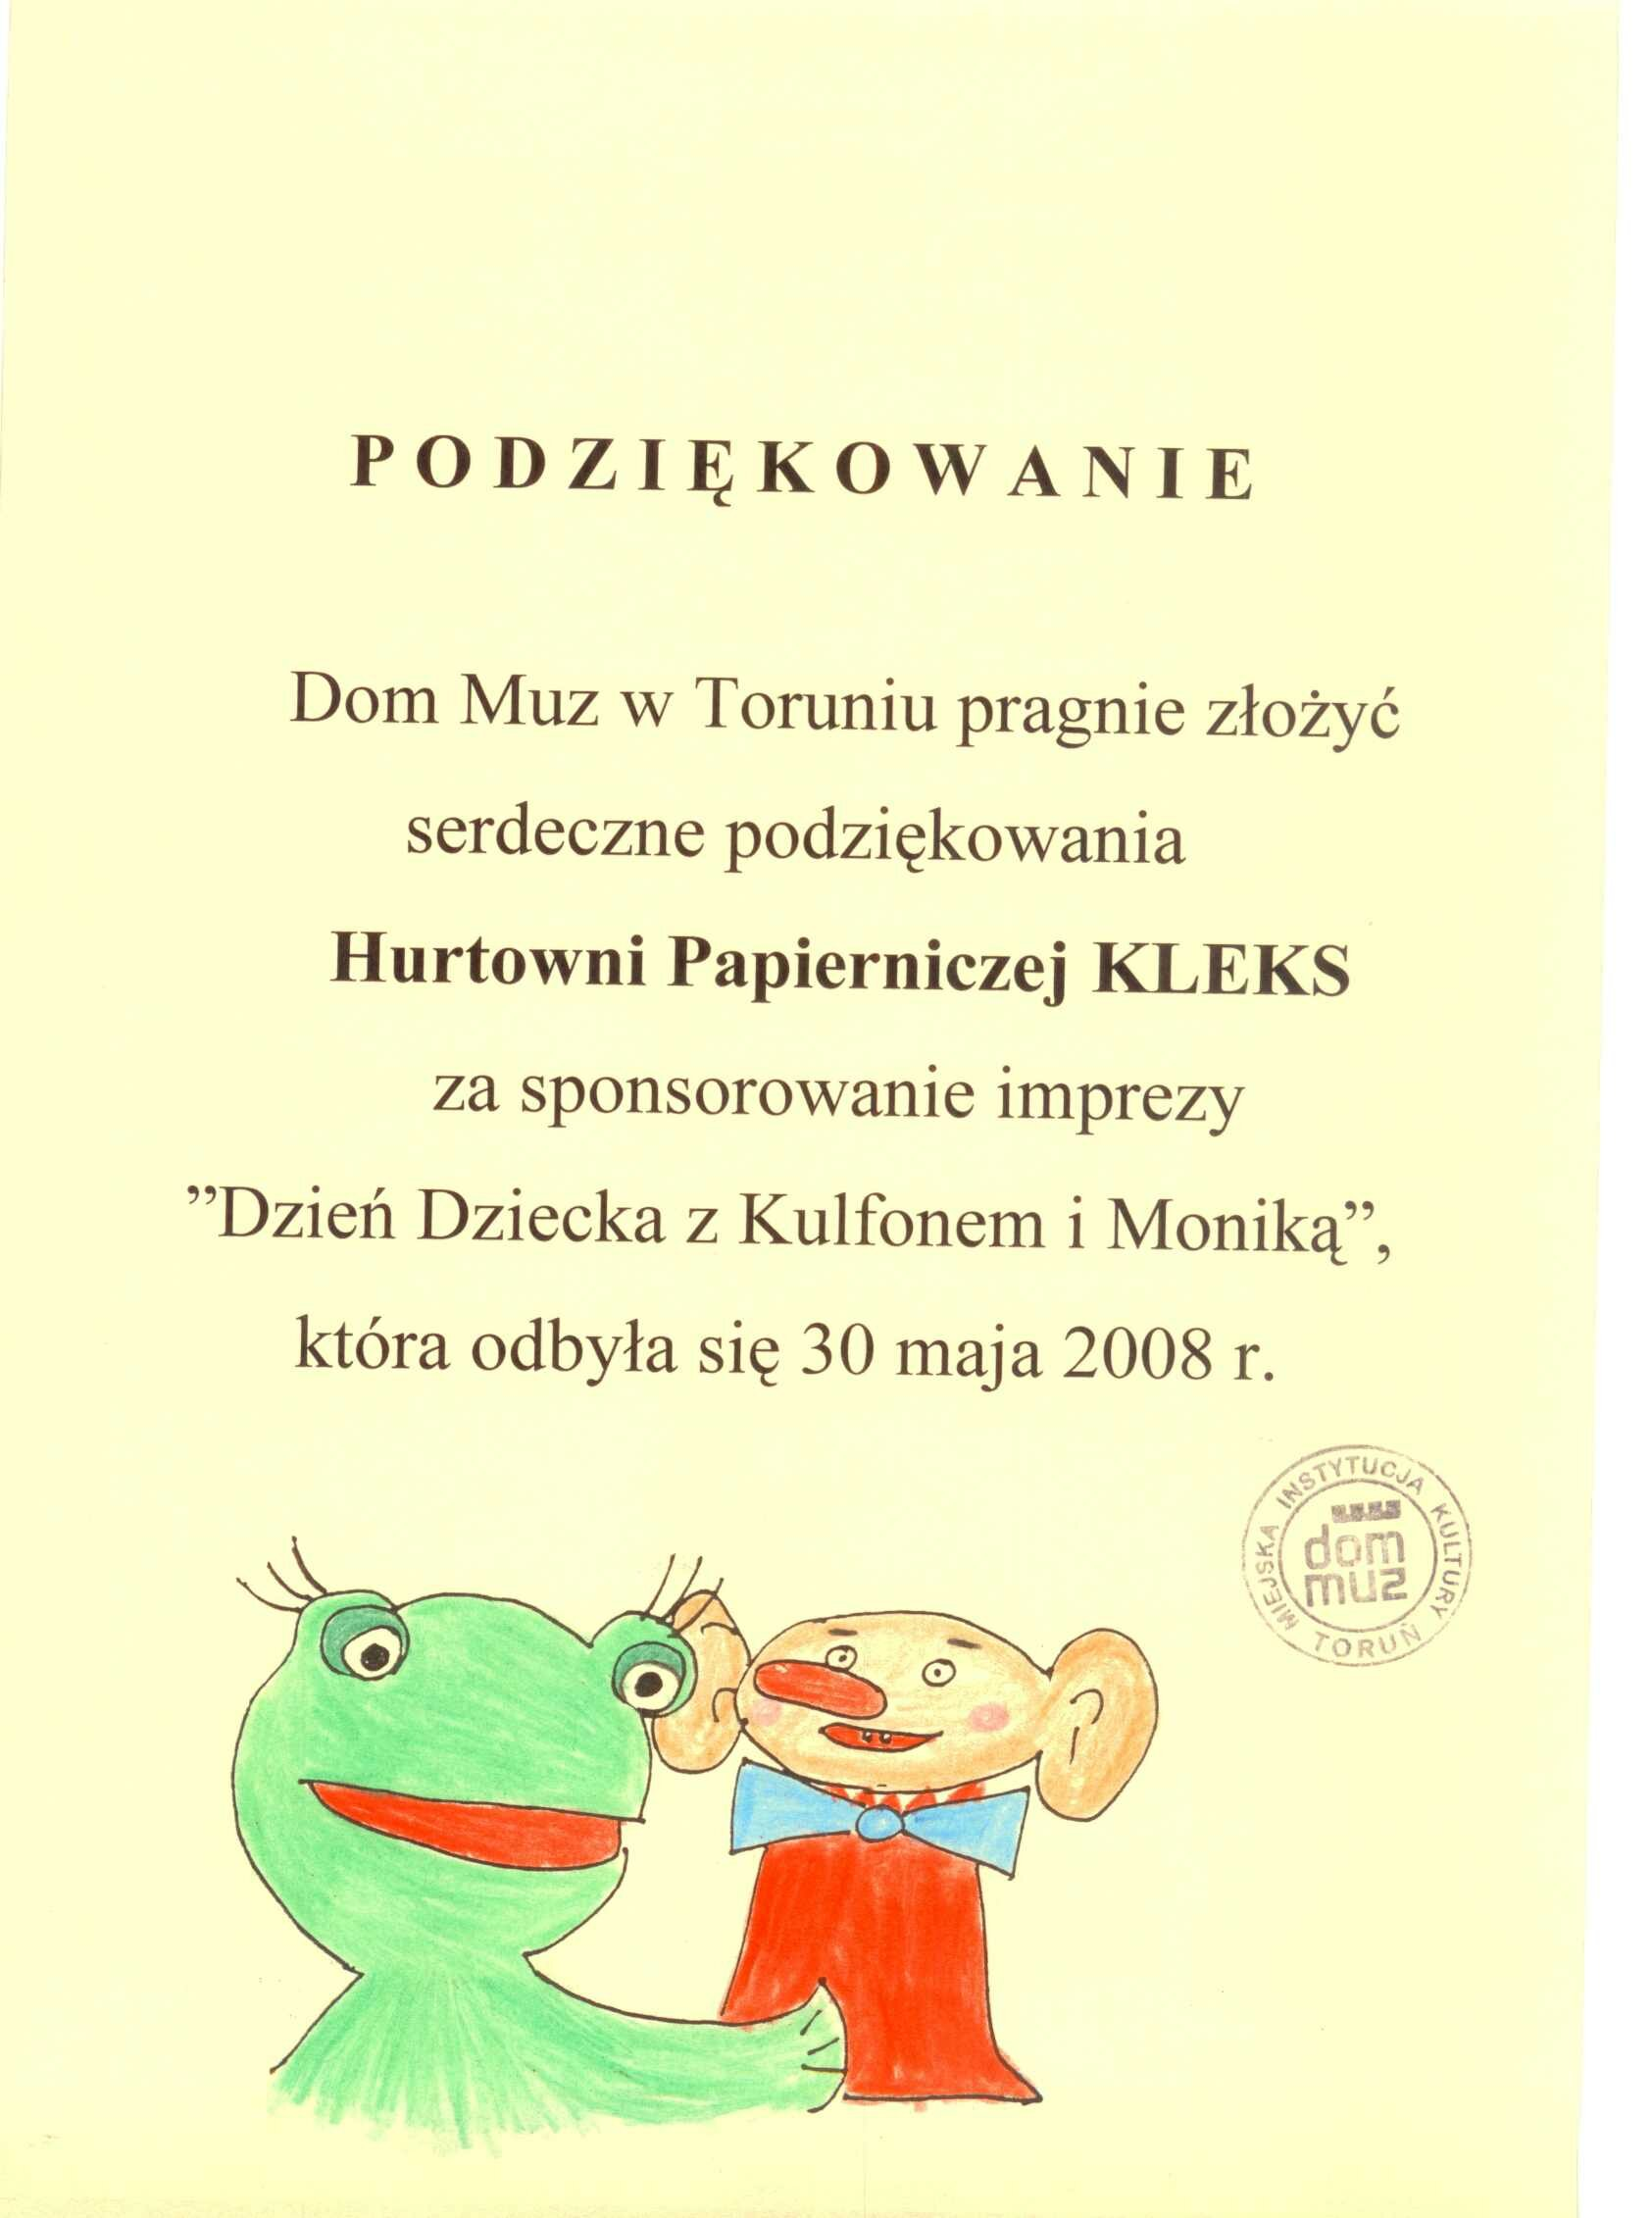 Dom Muz 2008